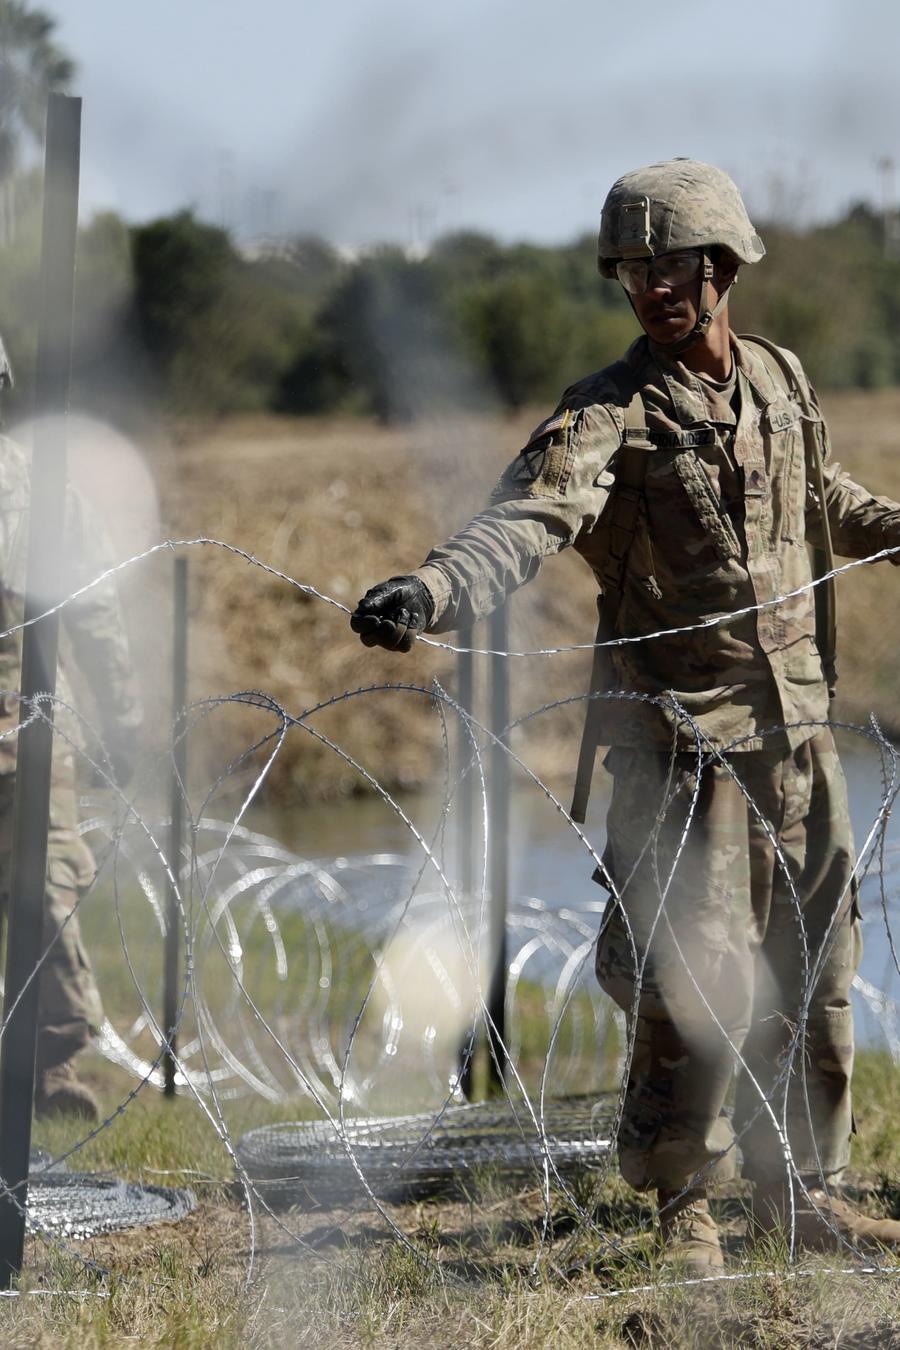 Miembros de las fuerzas armadas estadounidenses instalan varios niveles de cable de concertina